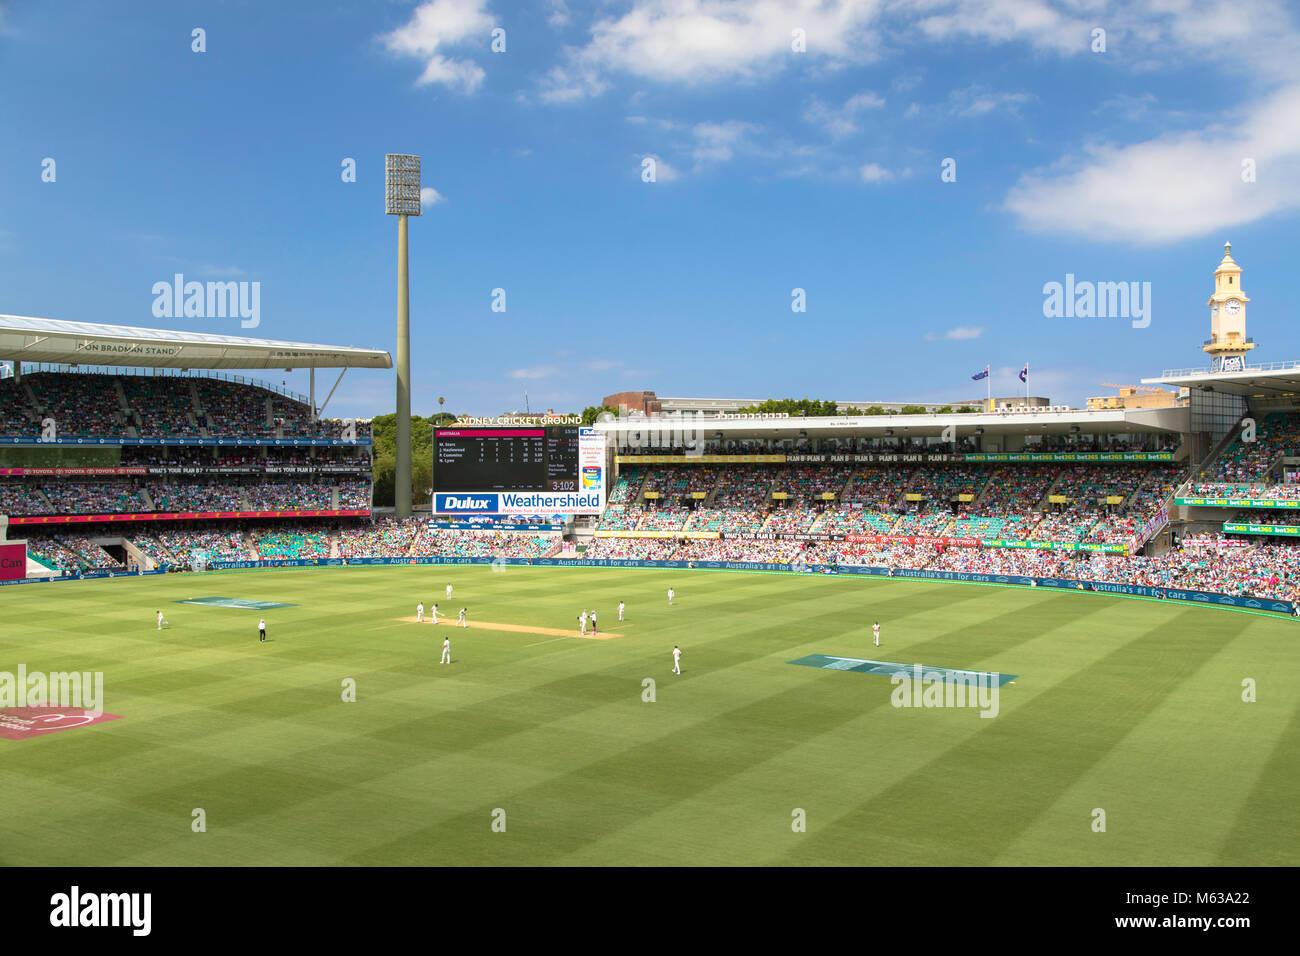 Test cricket match at Sydney Cricket Ground, Sydney, New South Wales, Australia Stock Photo